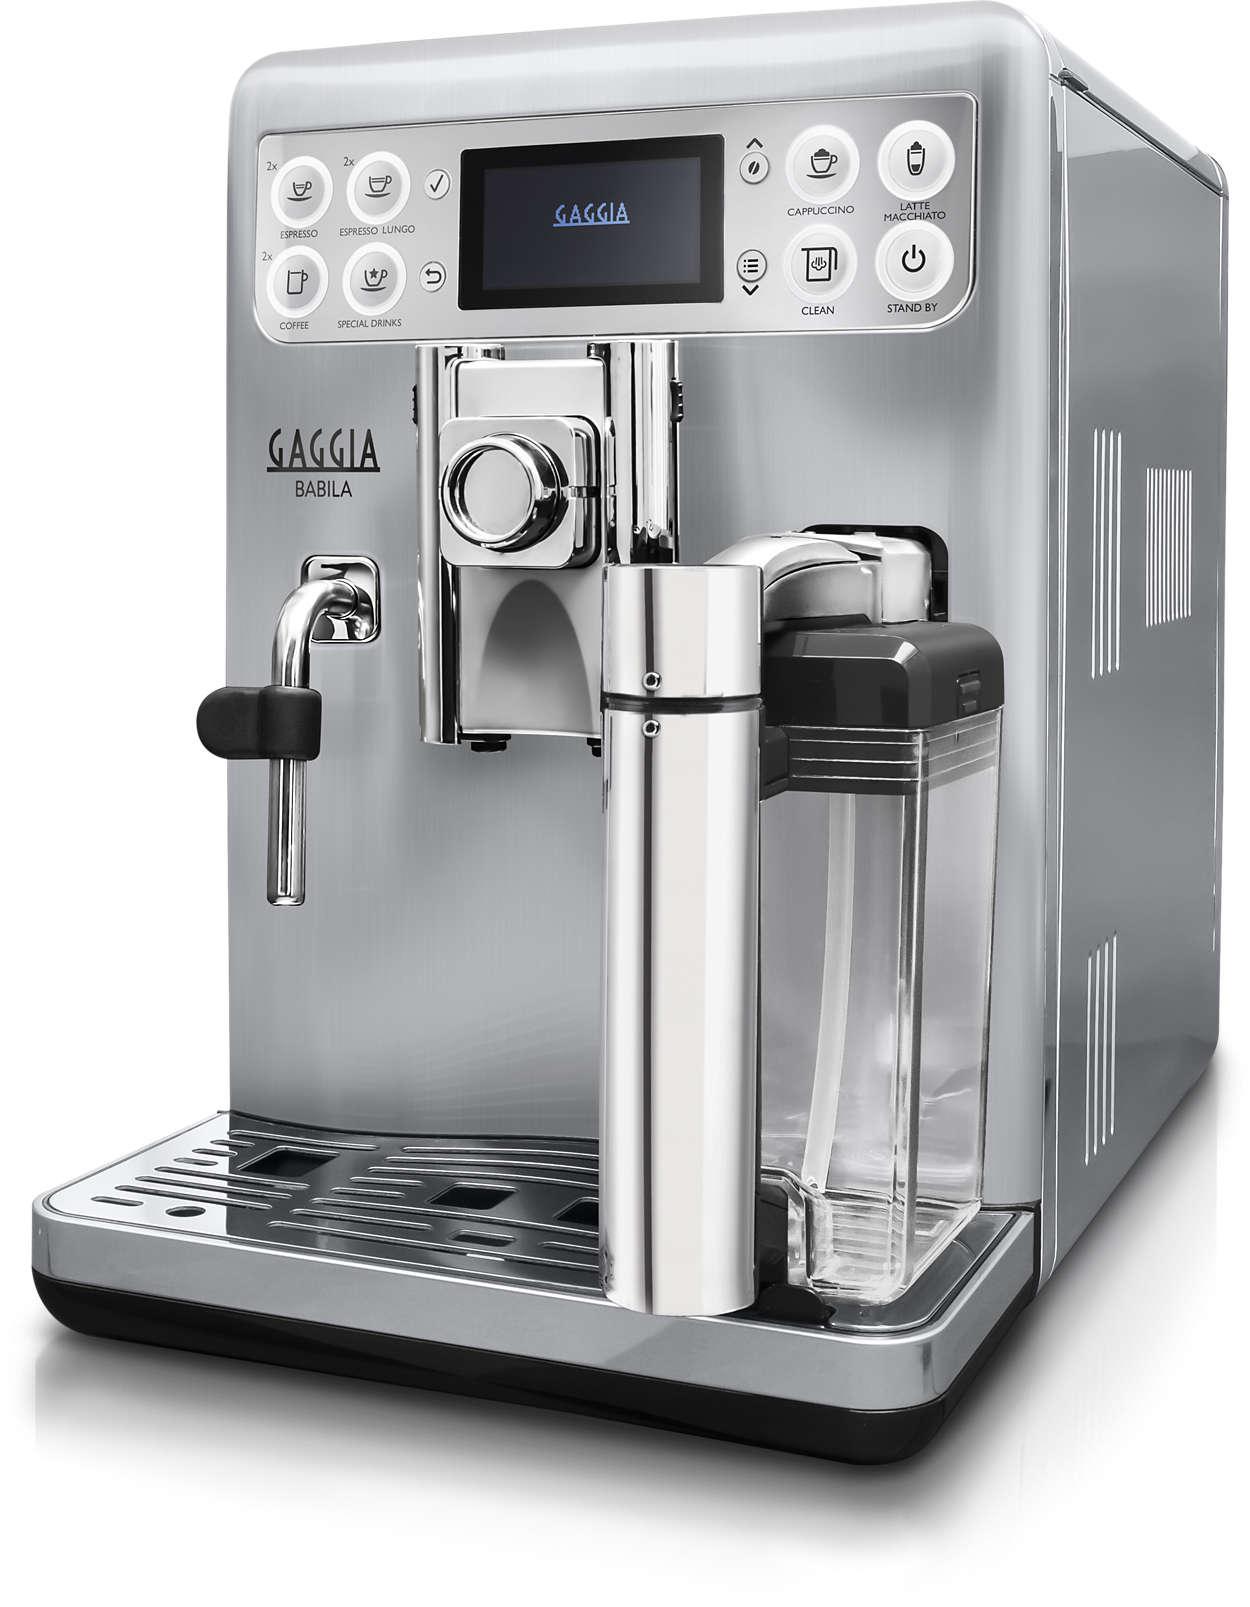 gaggia babila kaffeevollautomat ri9700 60 gaggia. Black Bedroom Furniture Sets. Home Design Ideas